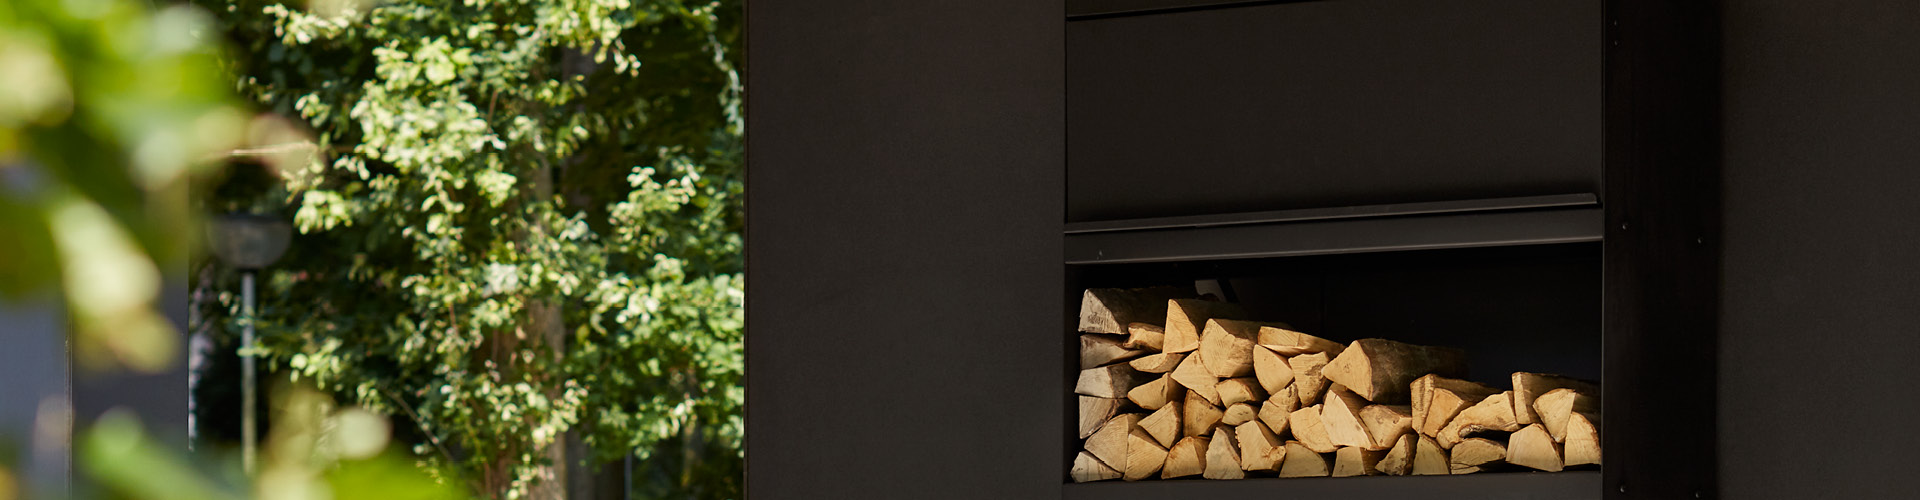 OFYR Wood Storages